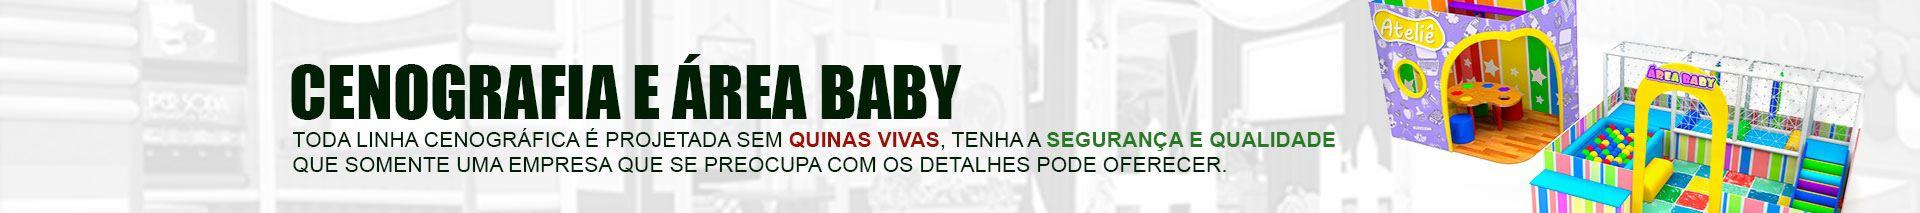 Cenografia-Area-baby